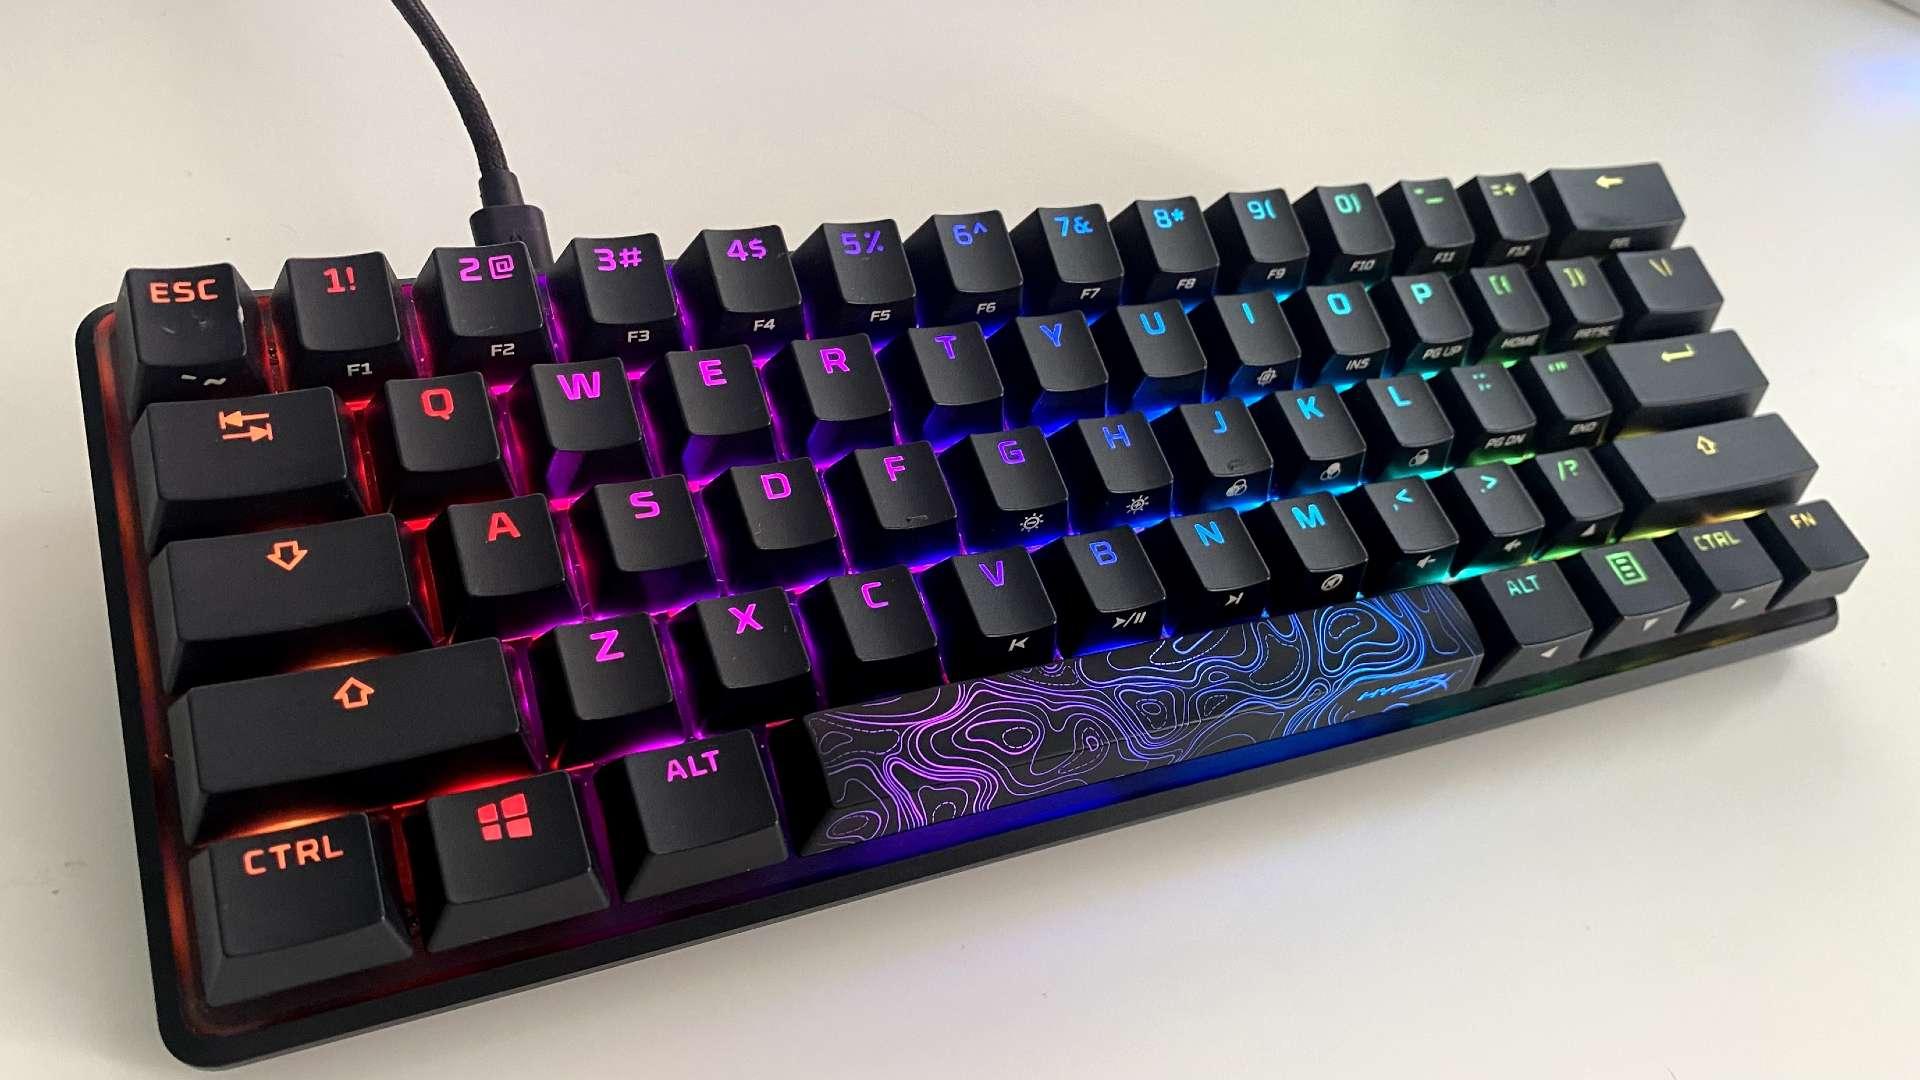 hyper-x-alloy-origins-60-gaming-keyboard-review